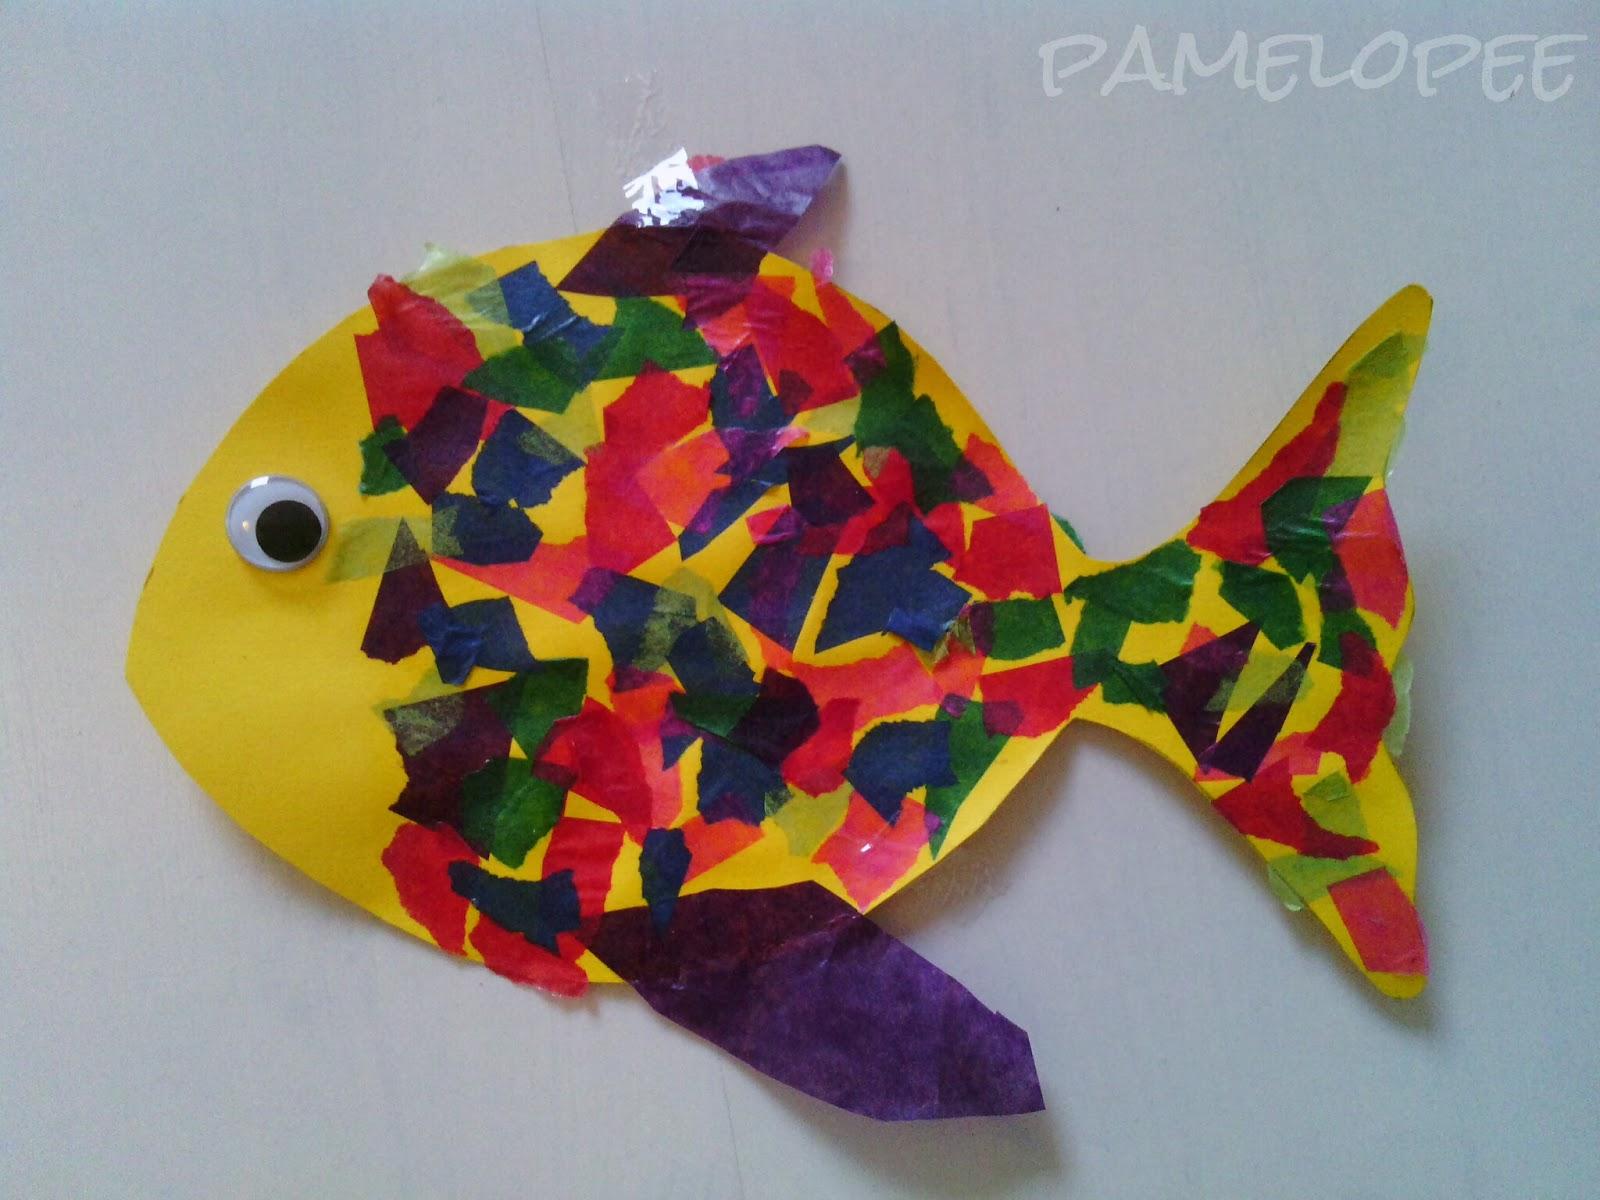 pamelopee fisch am freitag regenbogenfisch. Black Bedroom Furniture Sets. Home Design Ideas